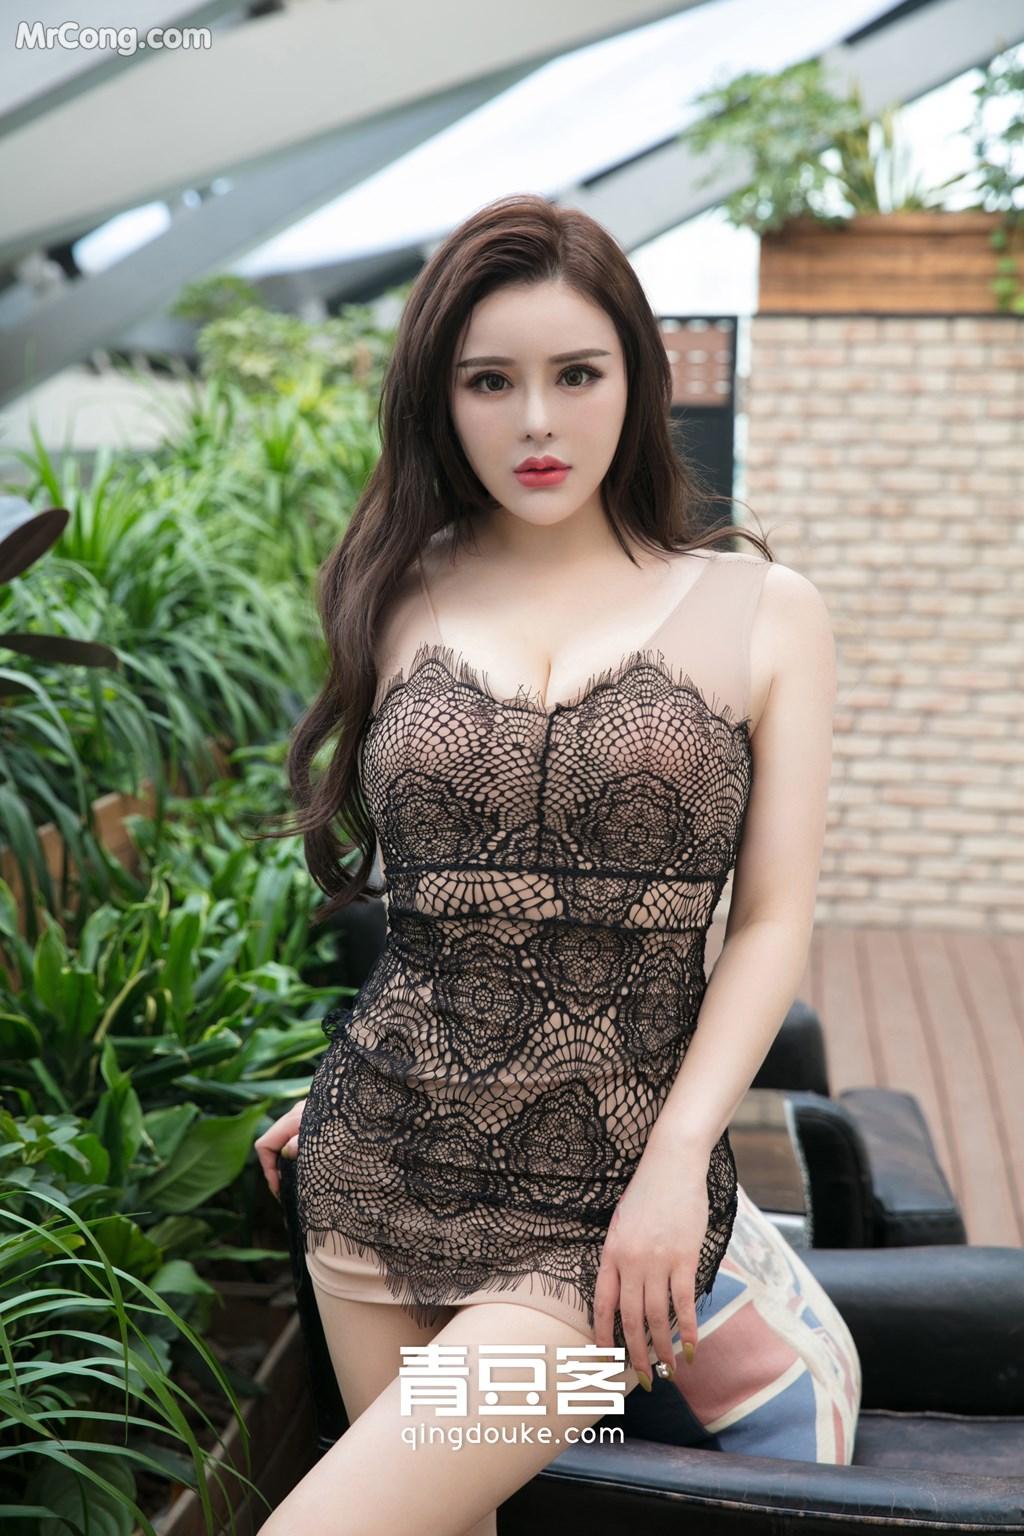 Image QingDouKe-2017-11-18-Jin-Baby-MrCong.com-004 in post QingDouKe 2017-11-18: Người mẫu Jin Baby (金baby) (49 ảnh)